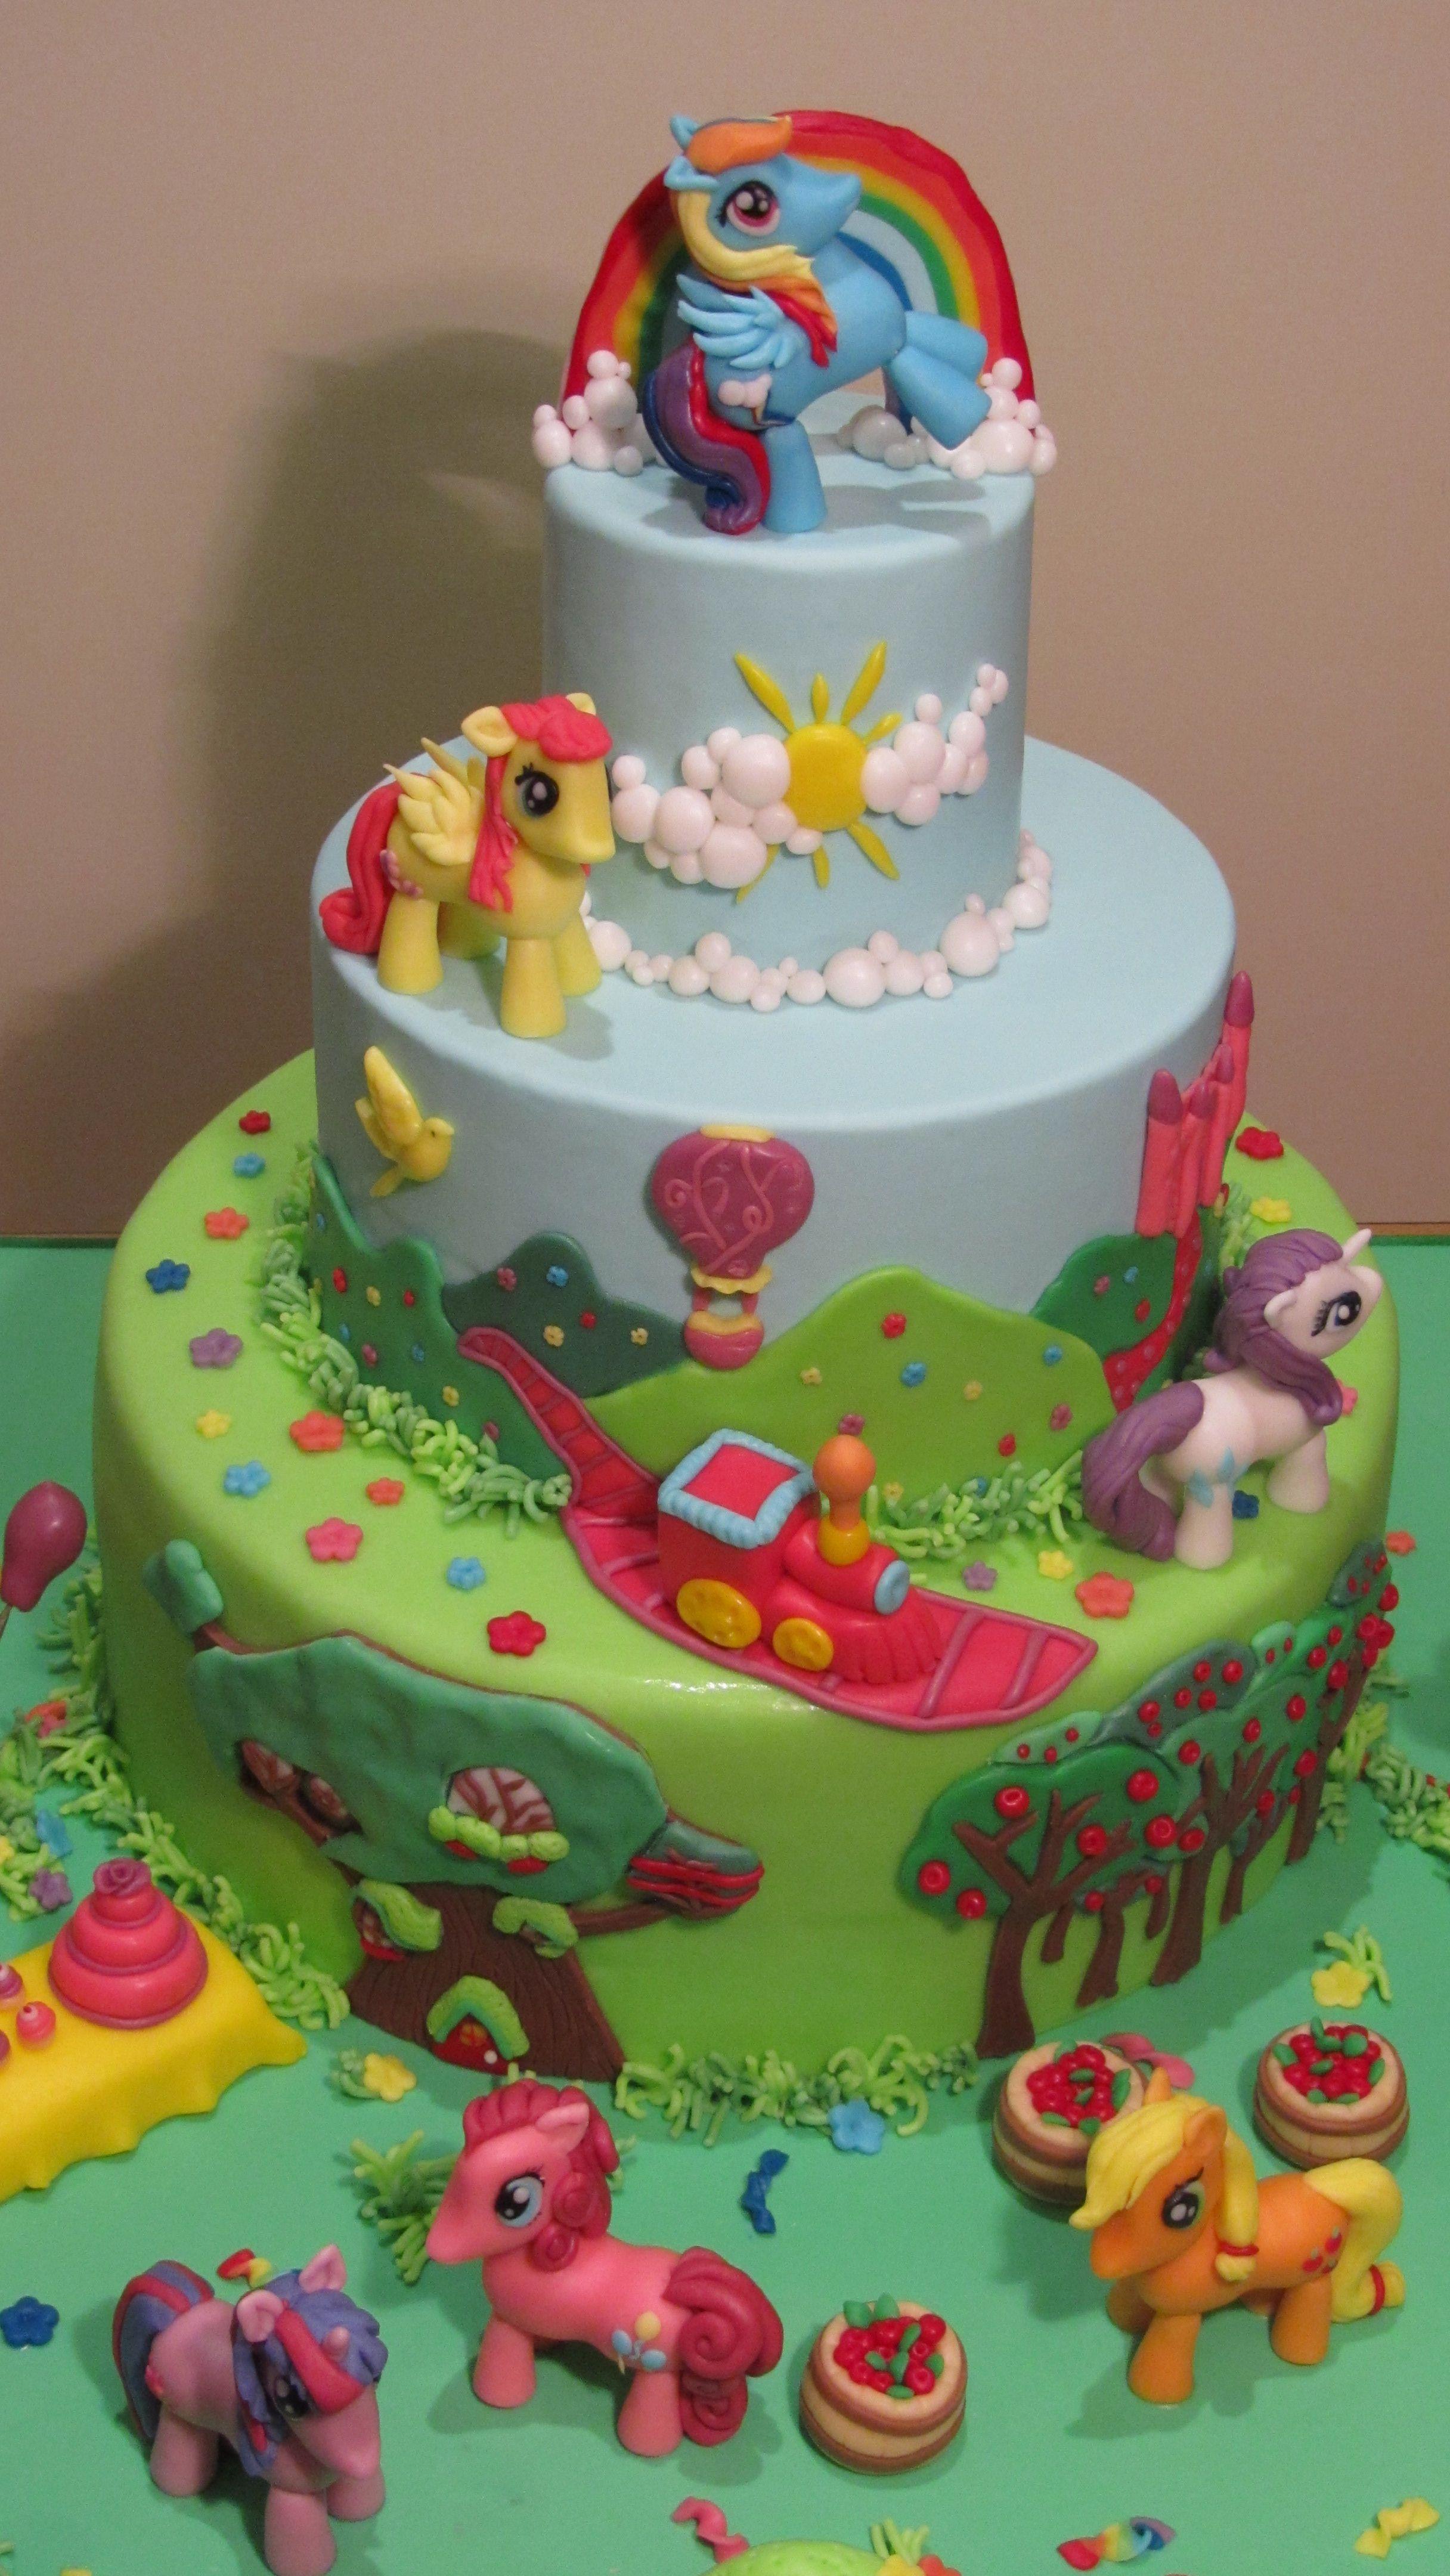 Pin Torta My Little Pony Flickr Photo Sharing Cake On Pinterest ...